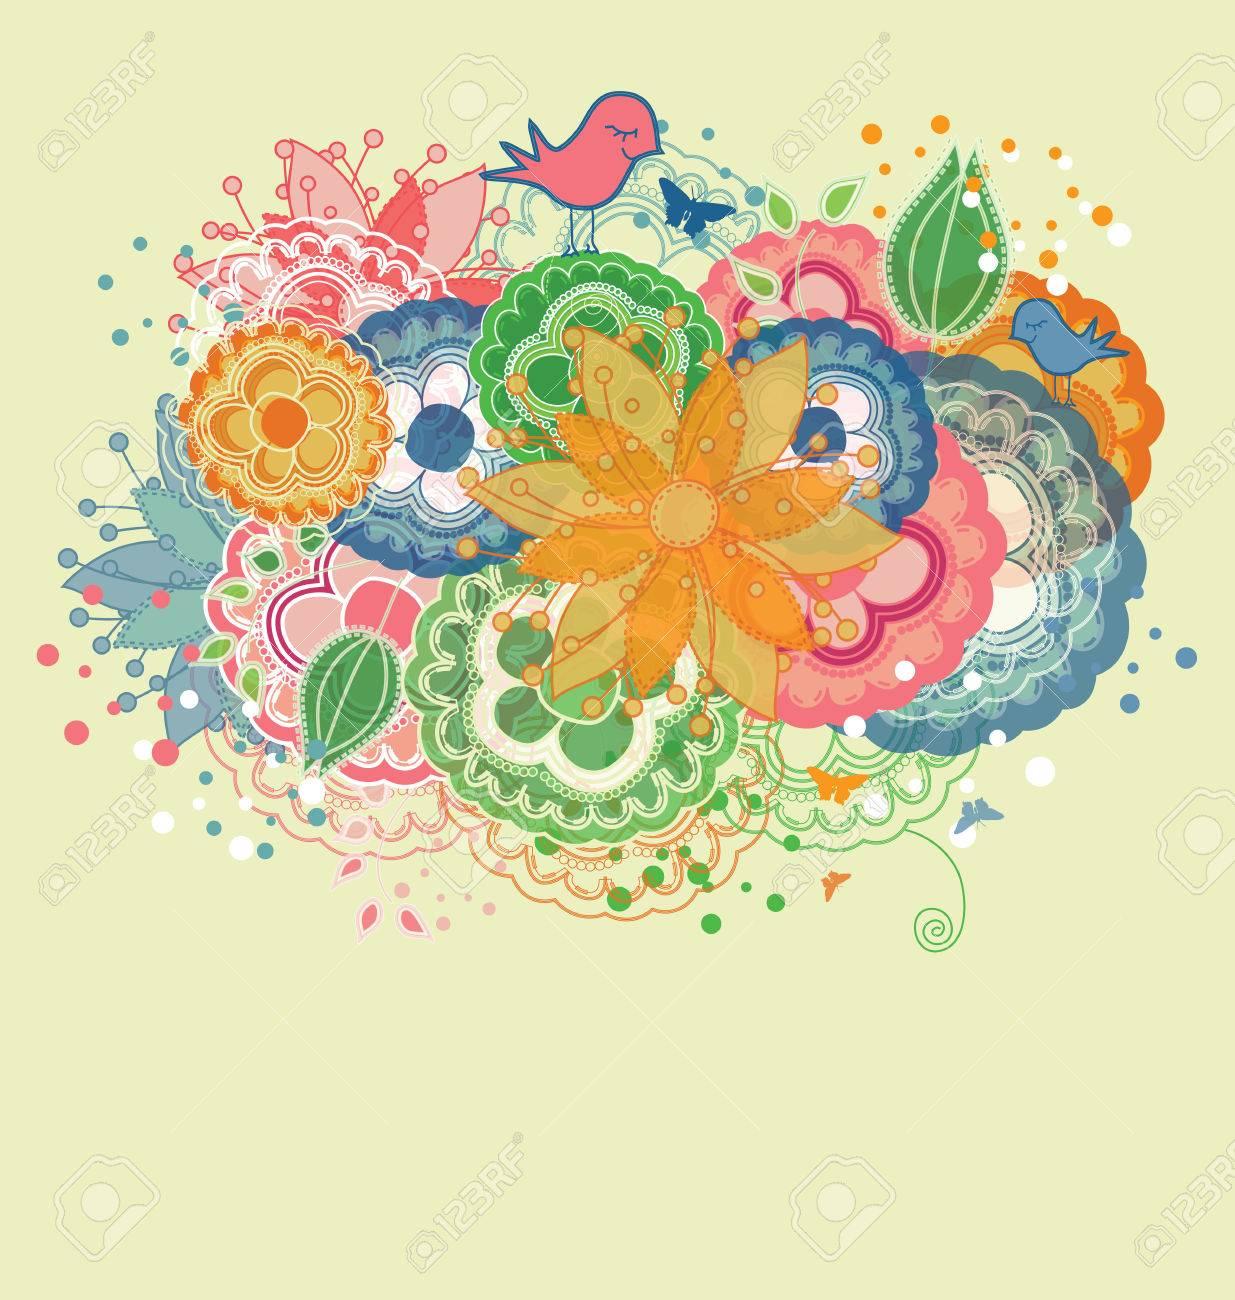 Cartoon Birds and Rainbow Colored Flowers Stock Vector - 8609894